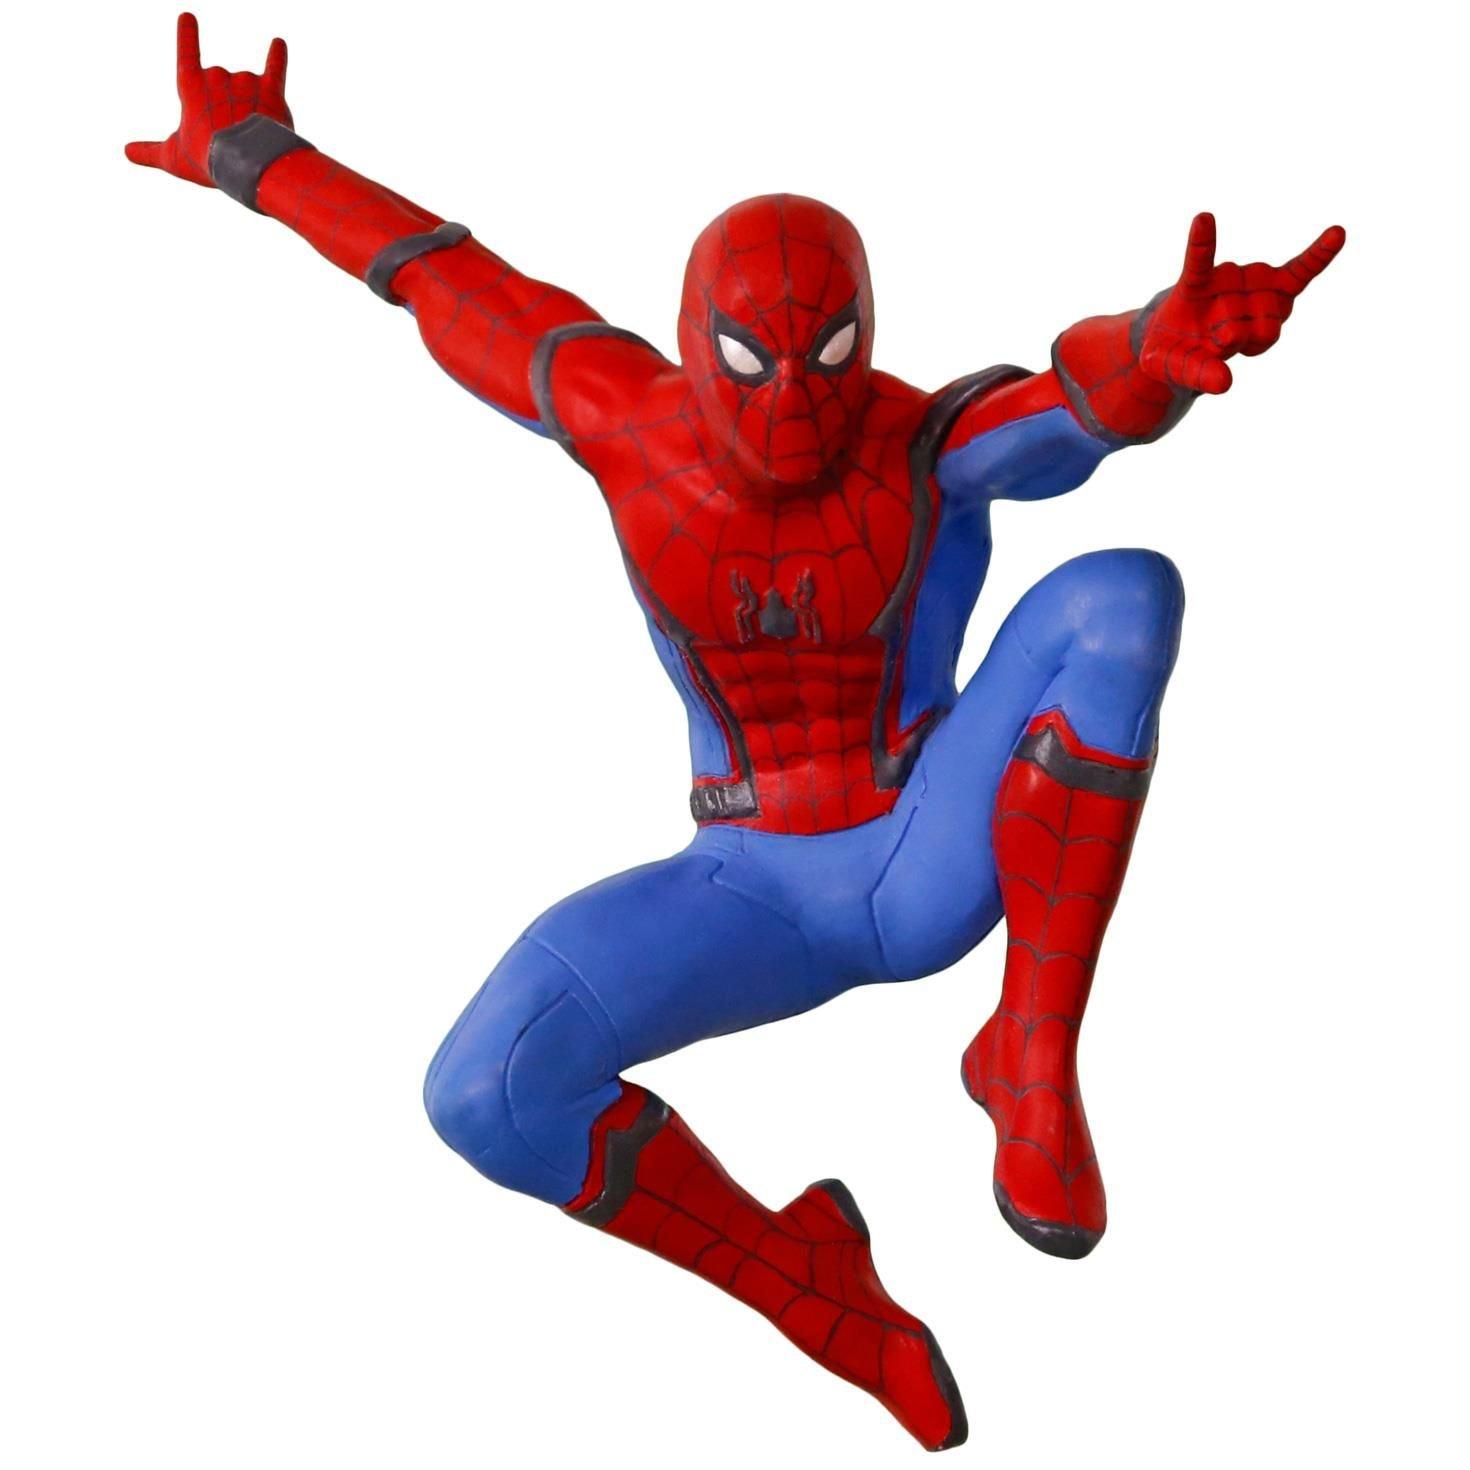 Hallmark Keepsake 2017 Spider-Man: Homecoming A New Kind of Hero Christmas Ornament